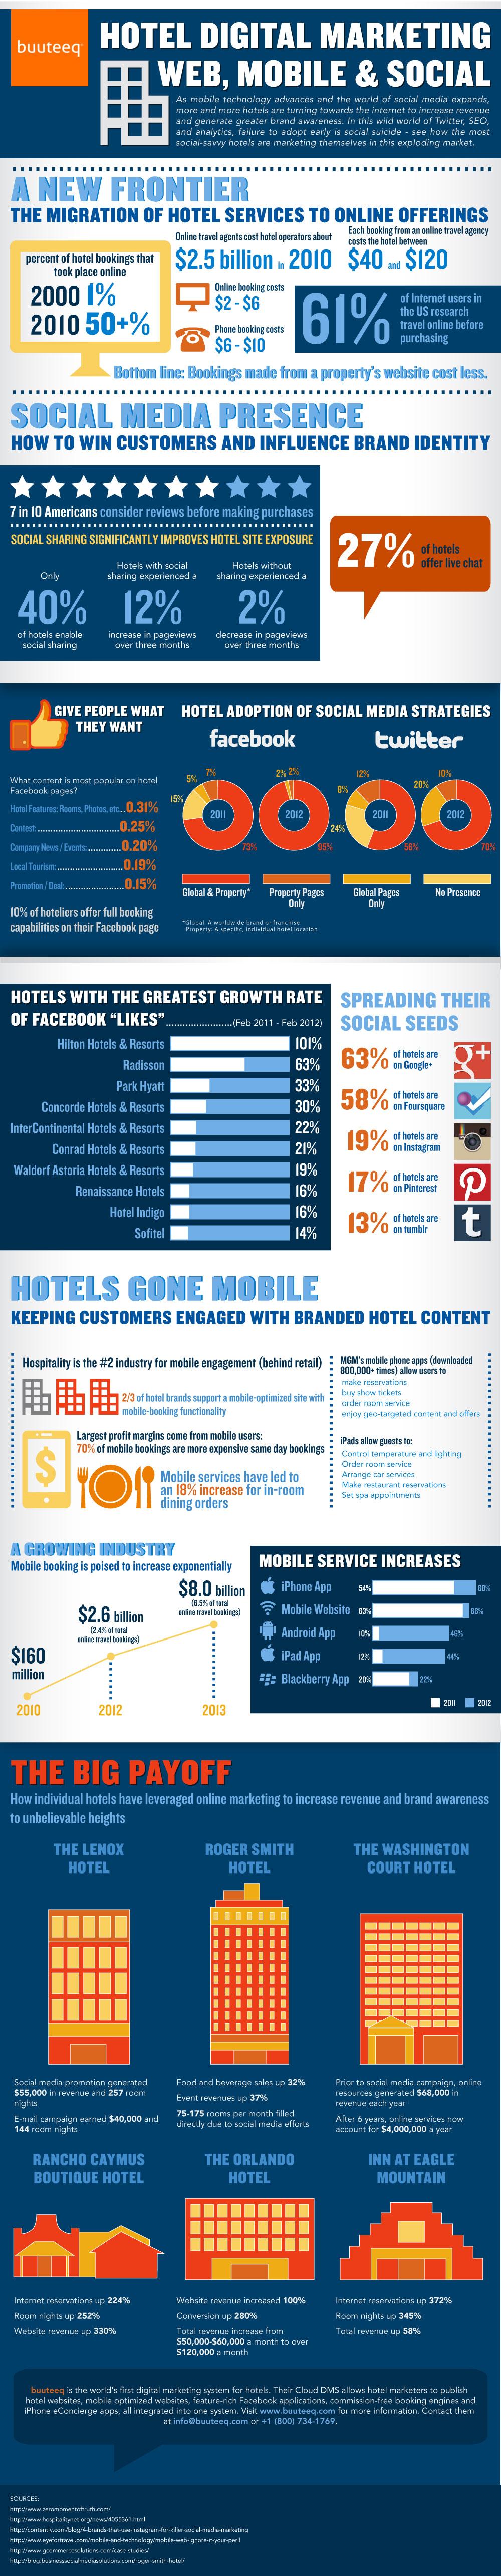 Hotel marketing on the Internet